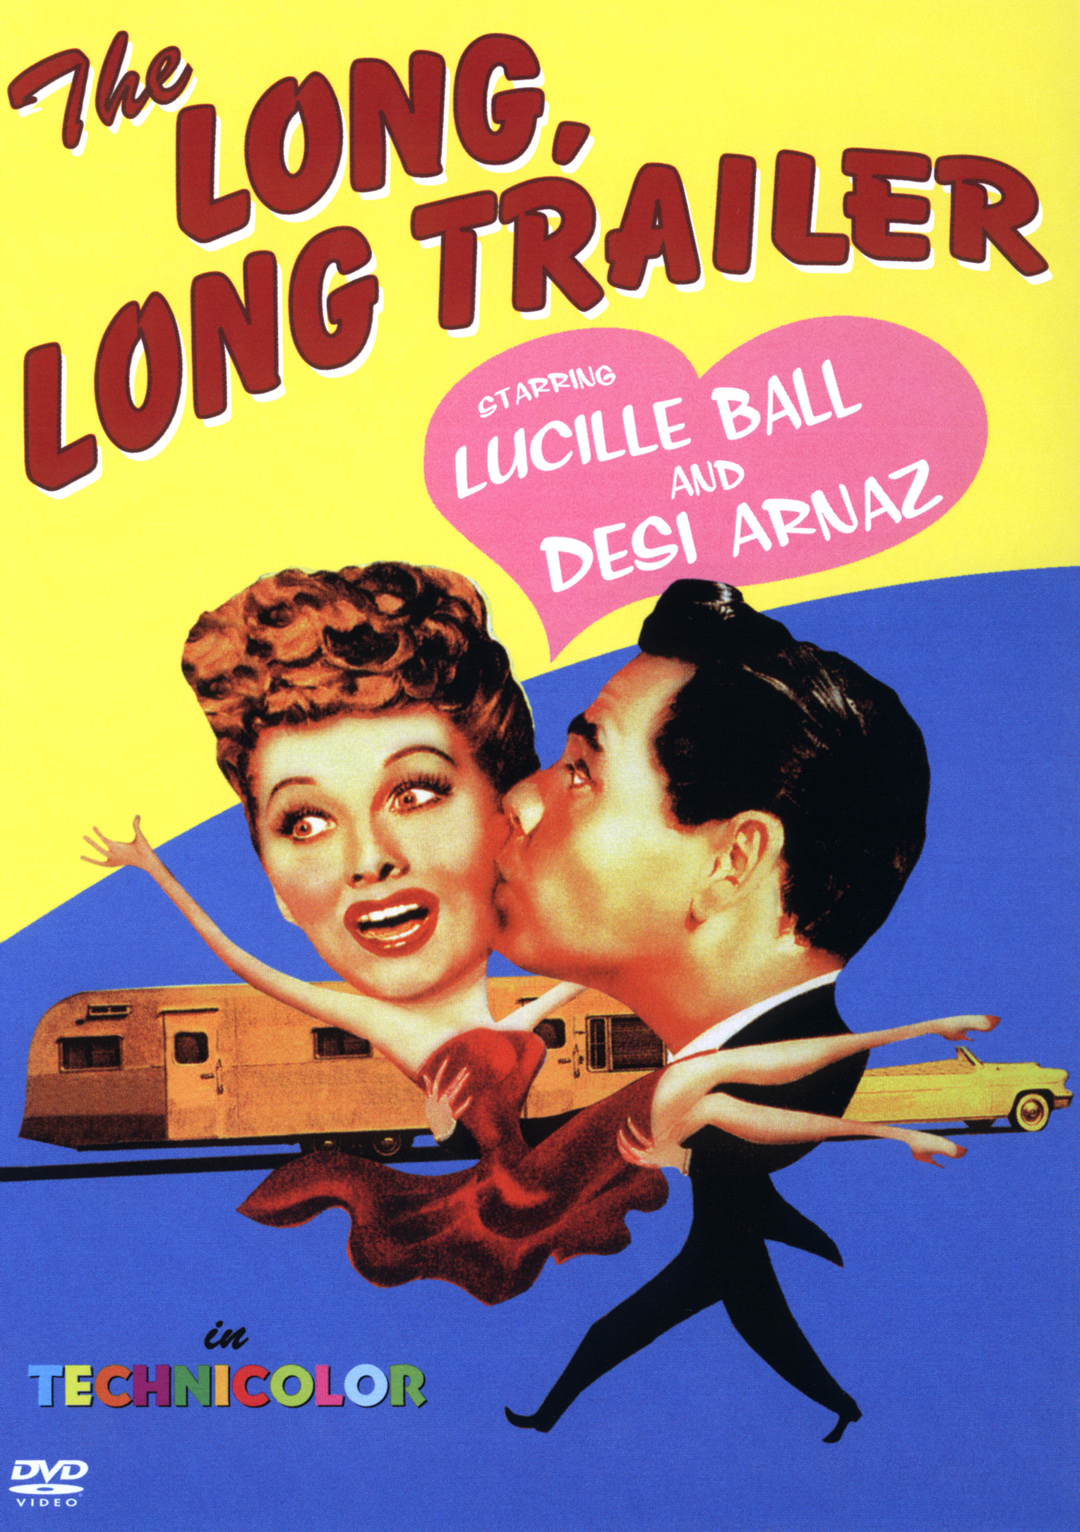 I Love Lucy TV Show Trailer - Next Episode